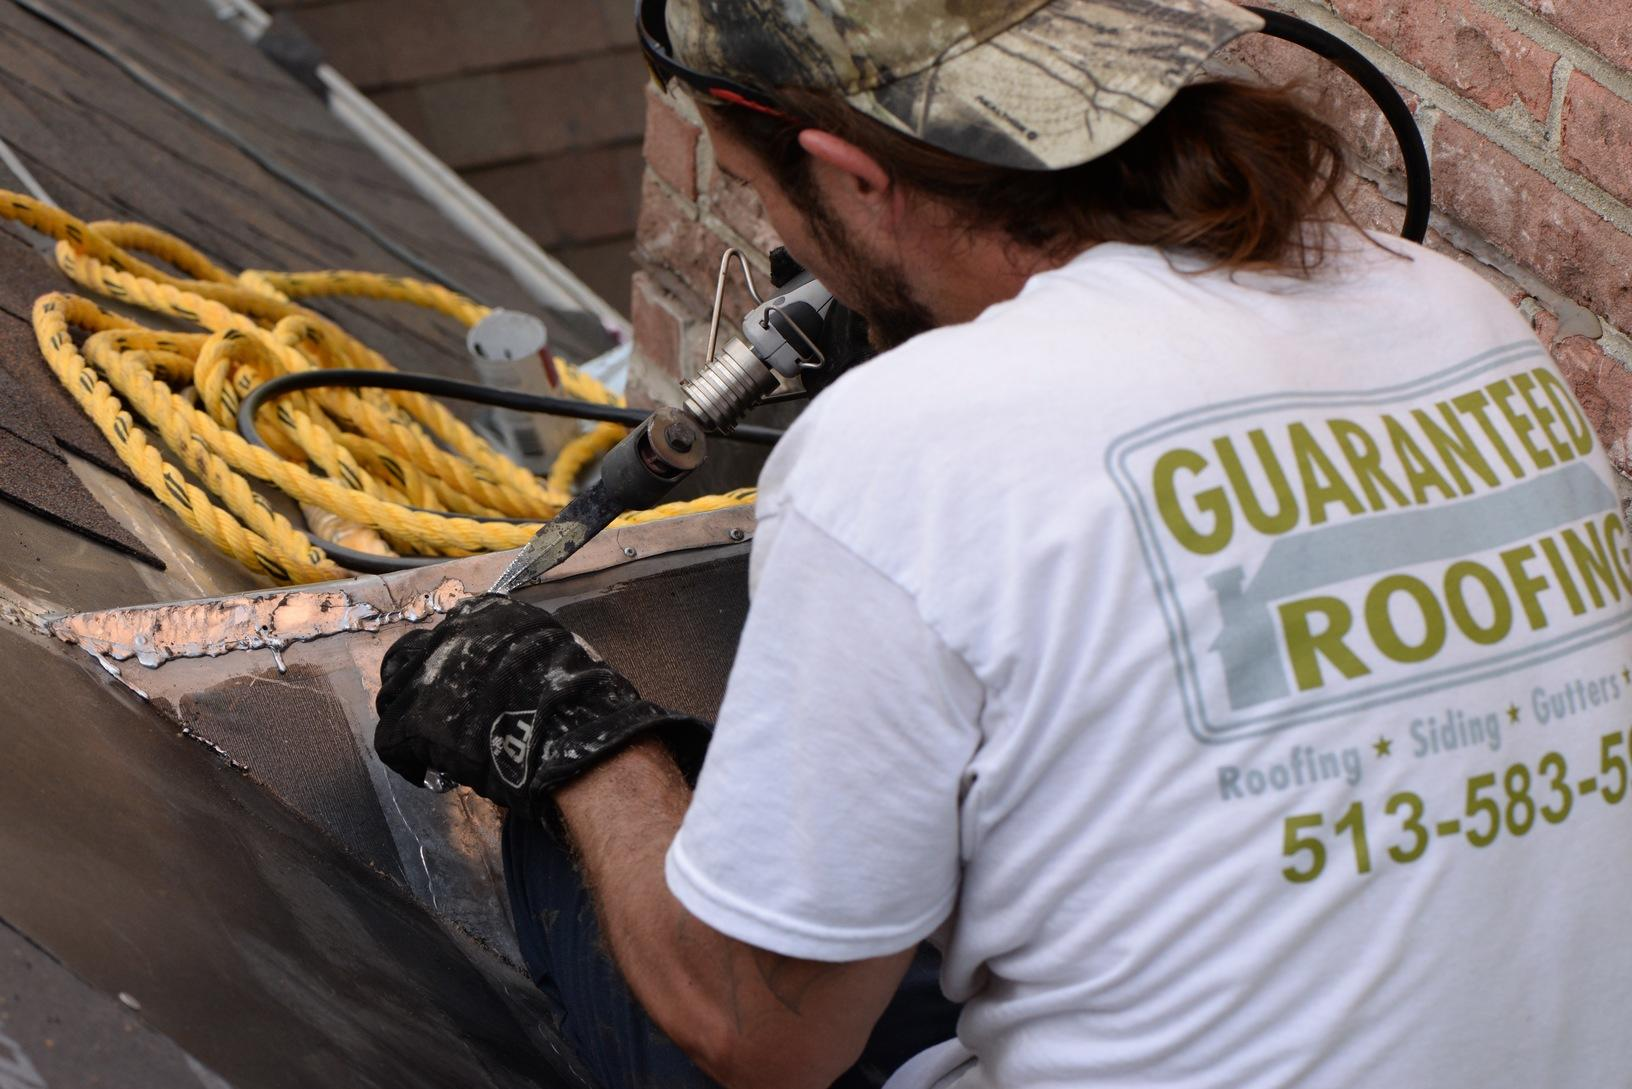 Madeira Ohio Guaranteed Roofing Cincinnati Ohio